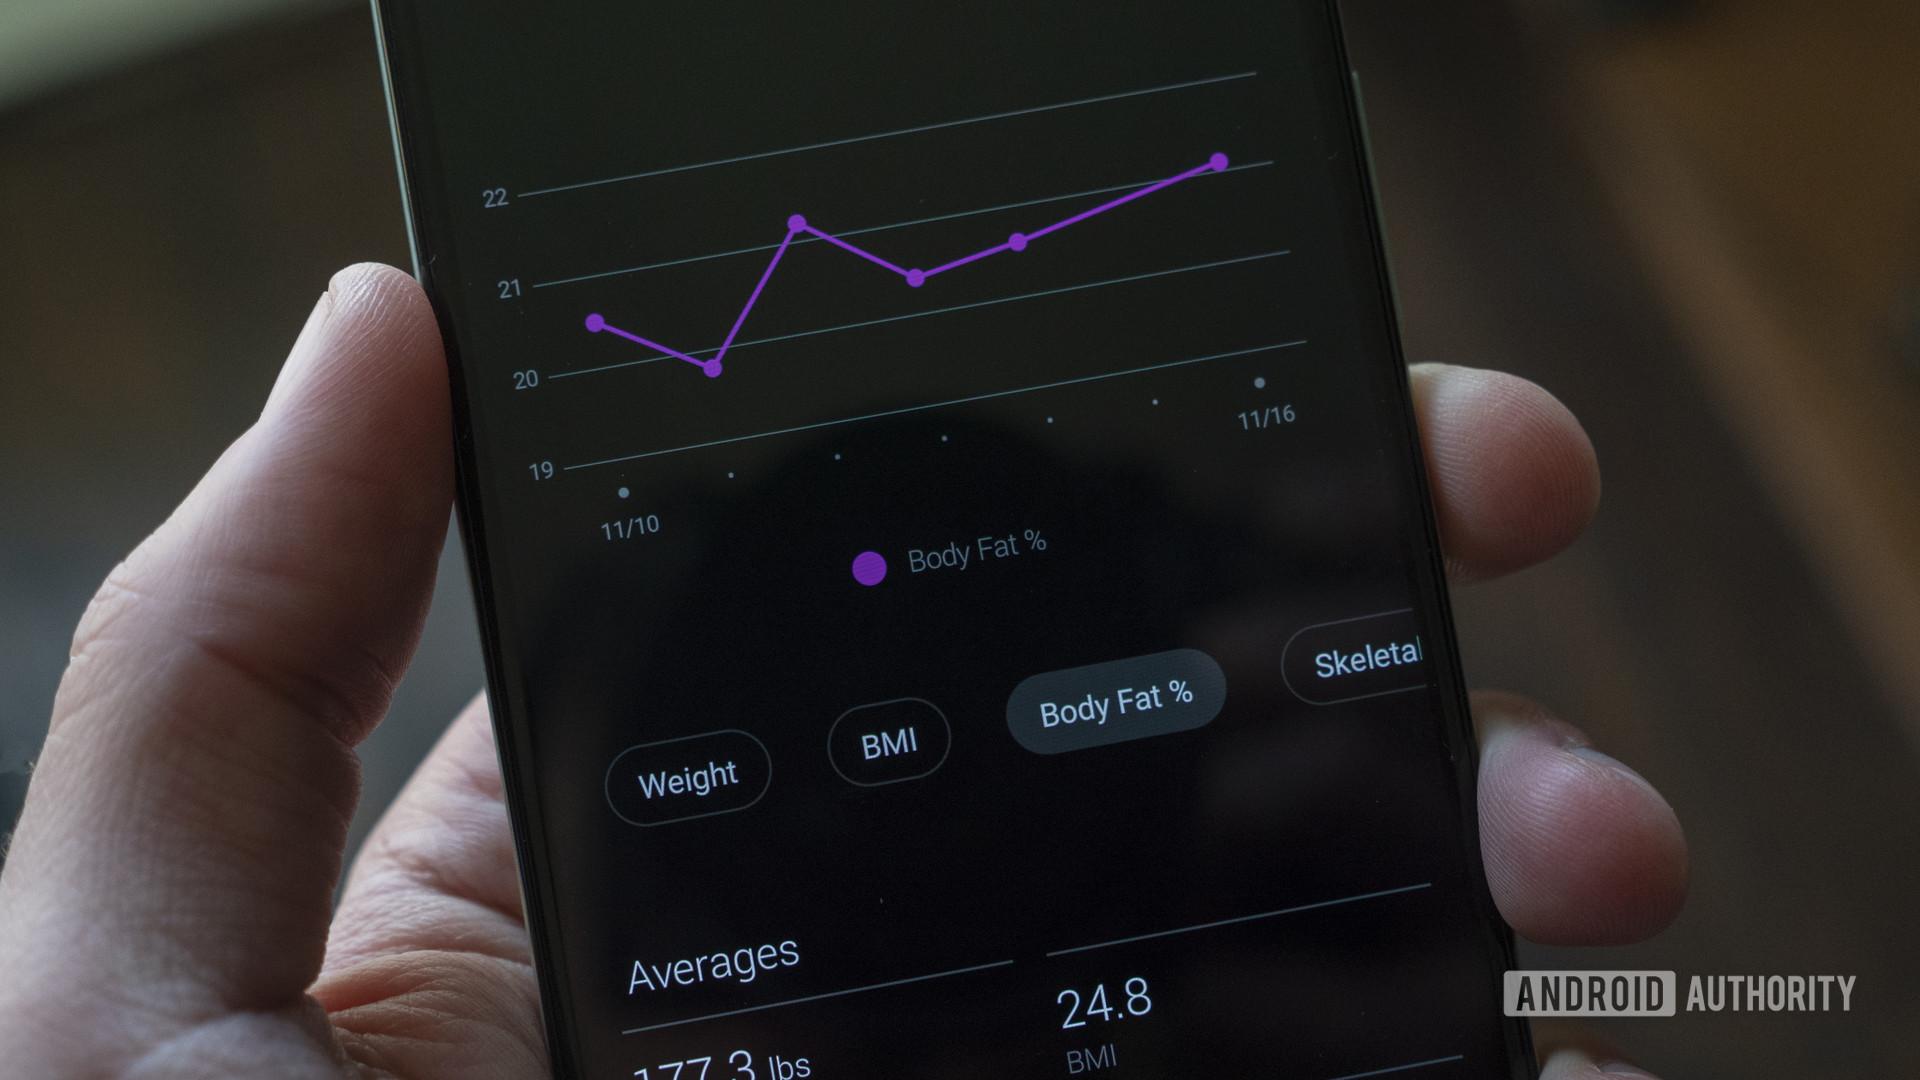 garmin index s2 smart scale review garmin connect body fat percentage trend